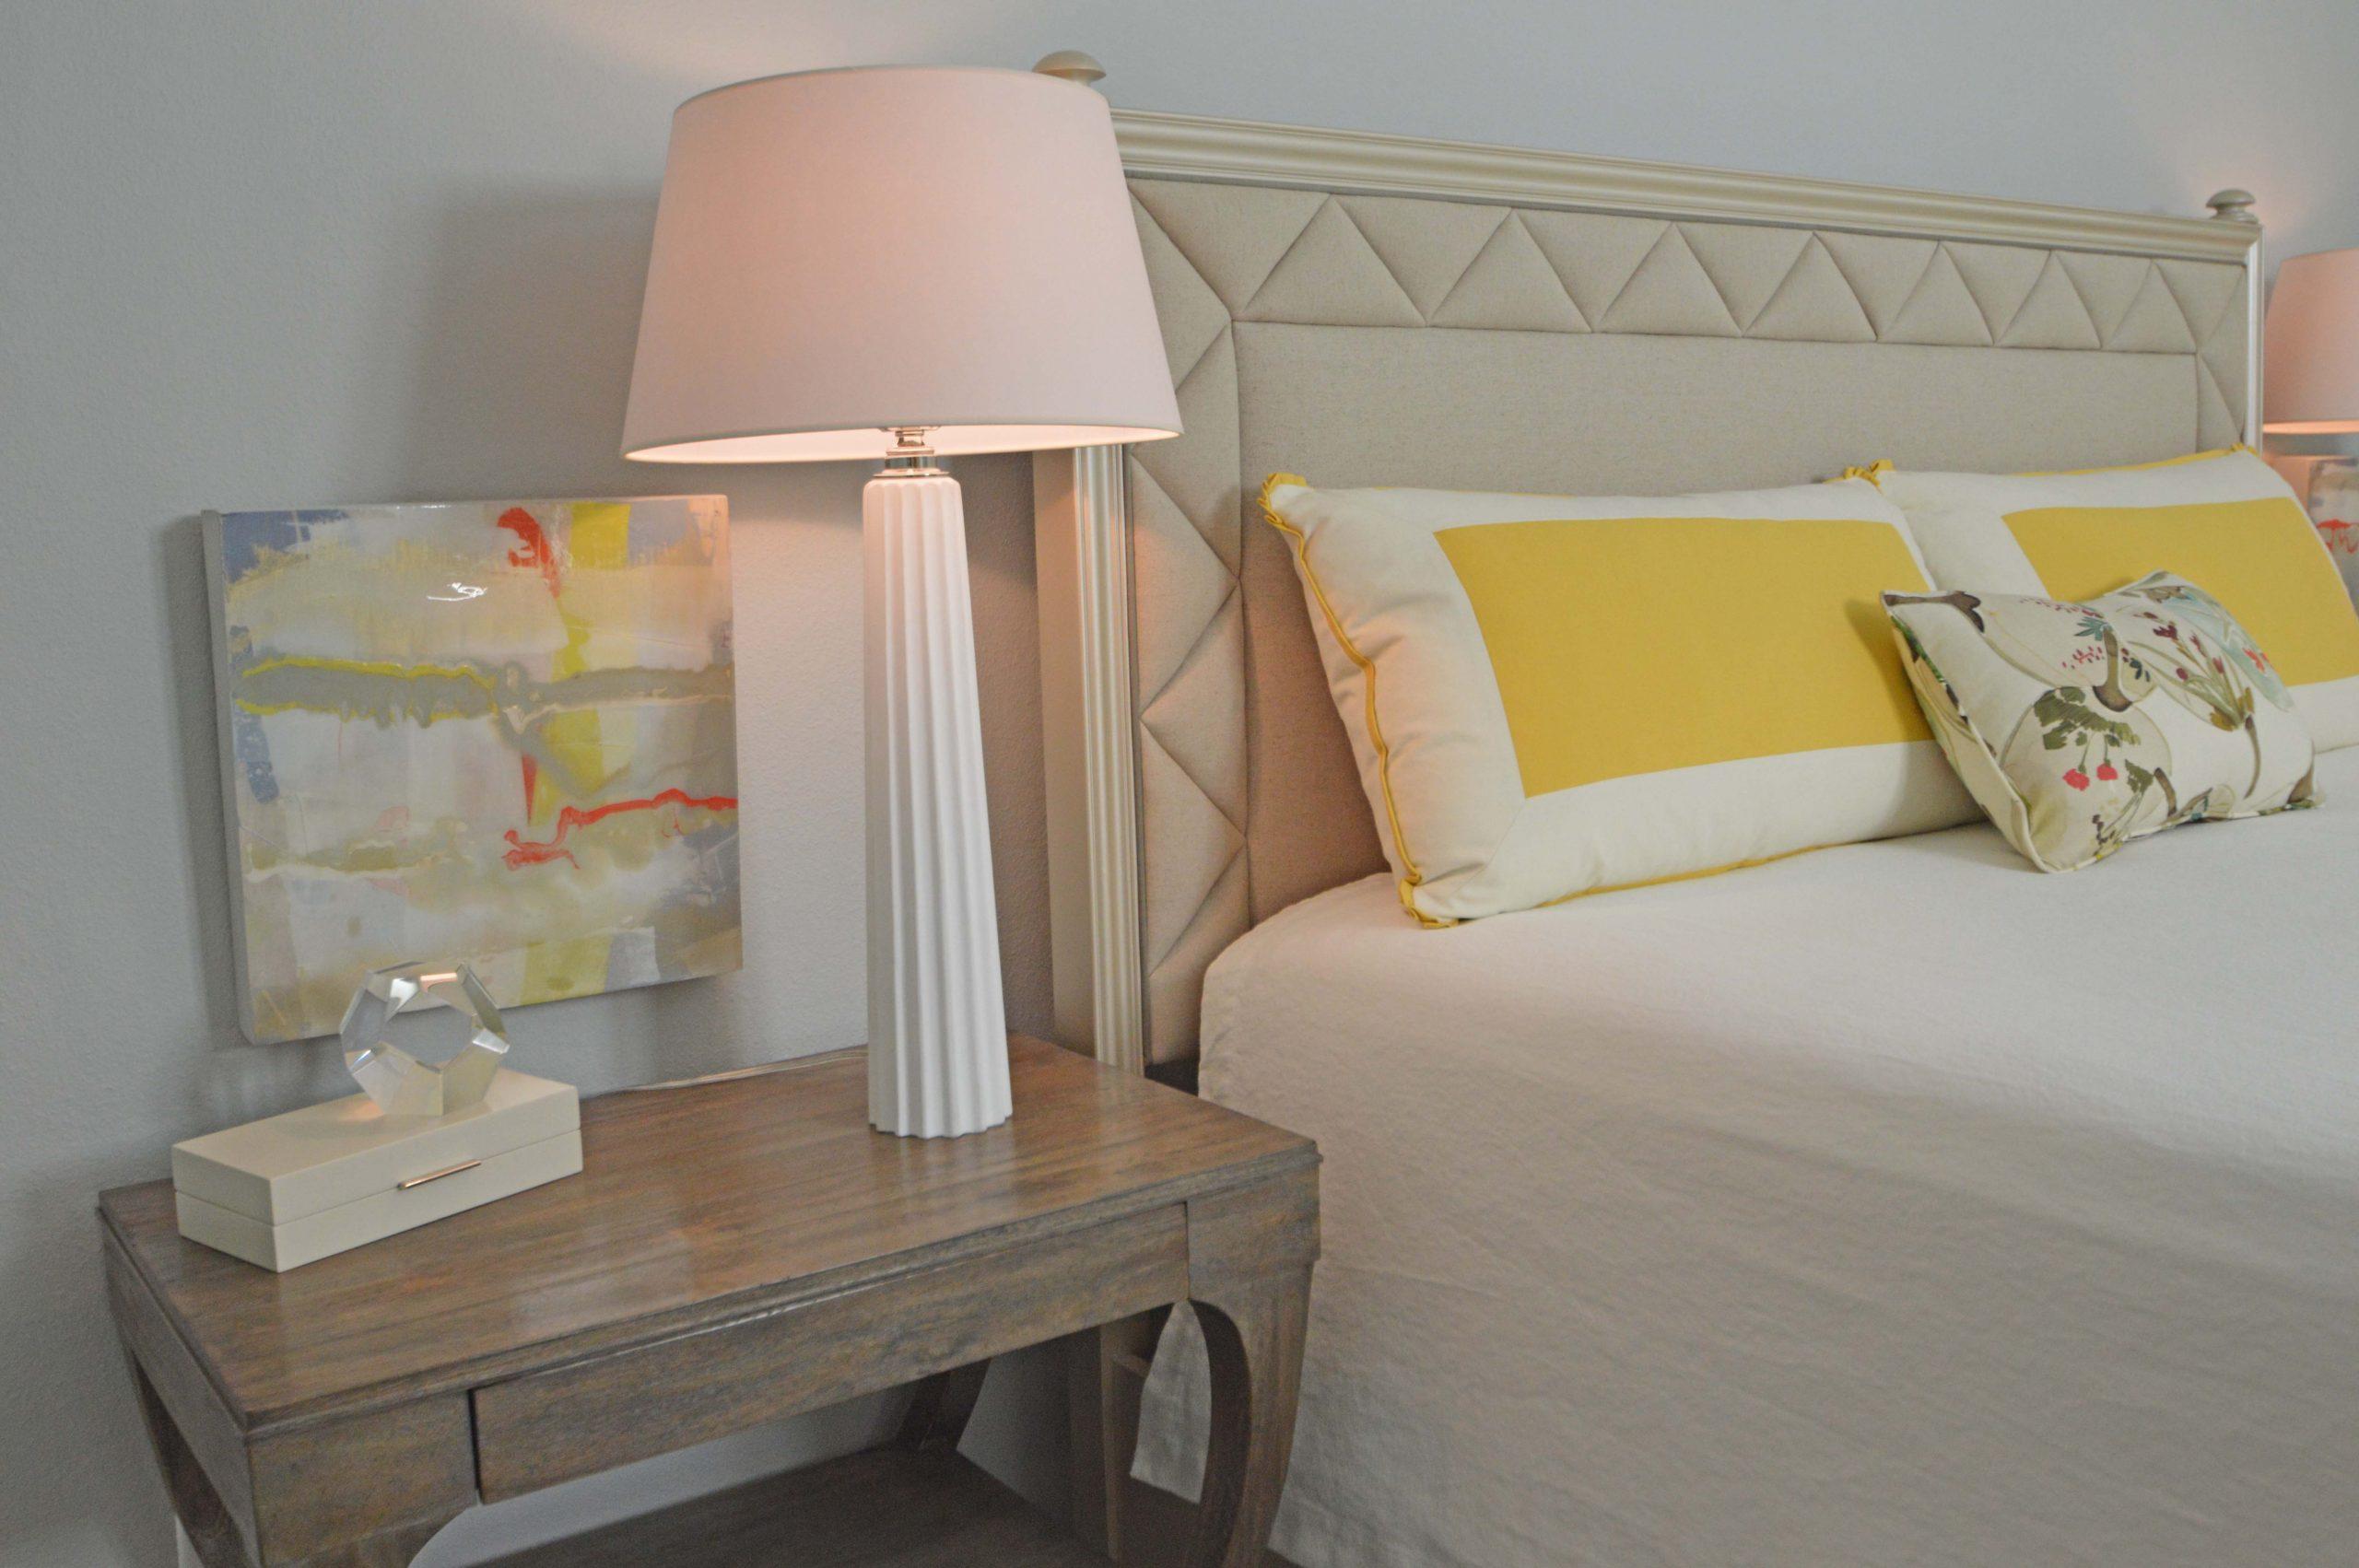 maranto-david-dixon-smith-interiors-baton-rouge-interior-design-custom-furniture-web-0004